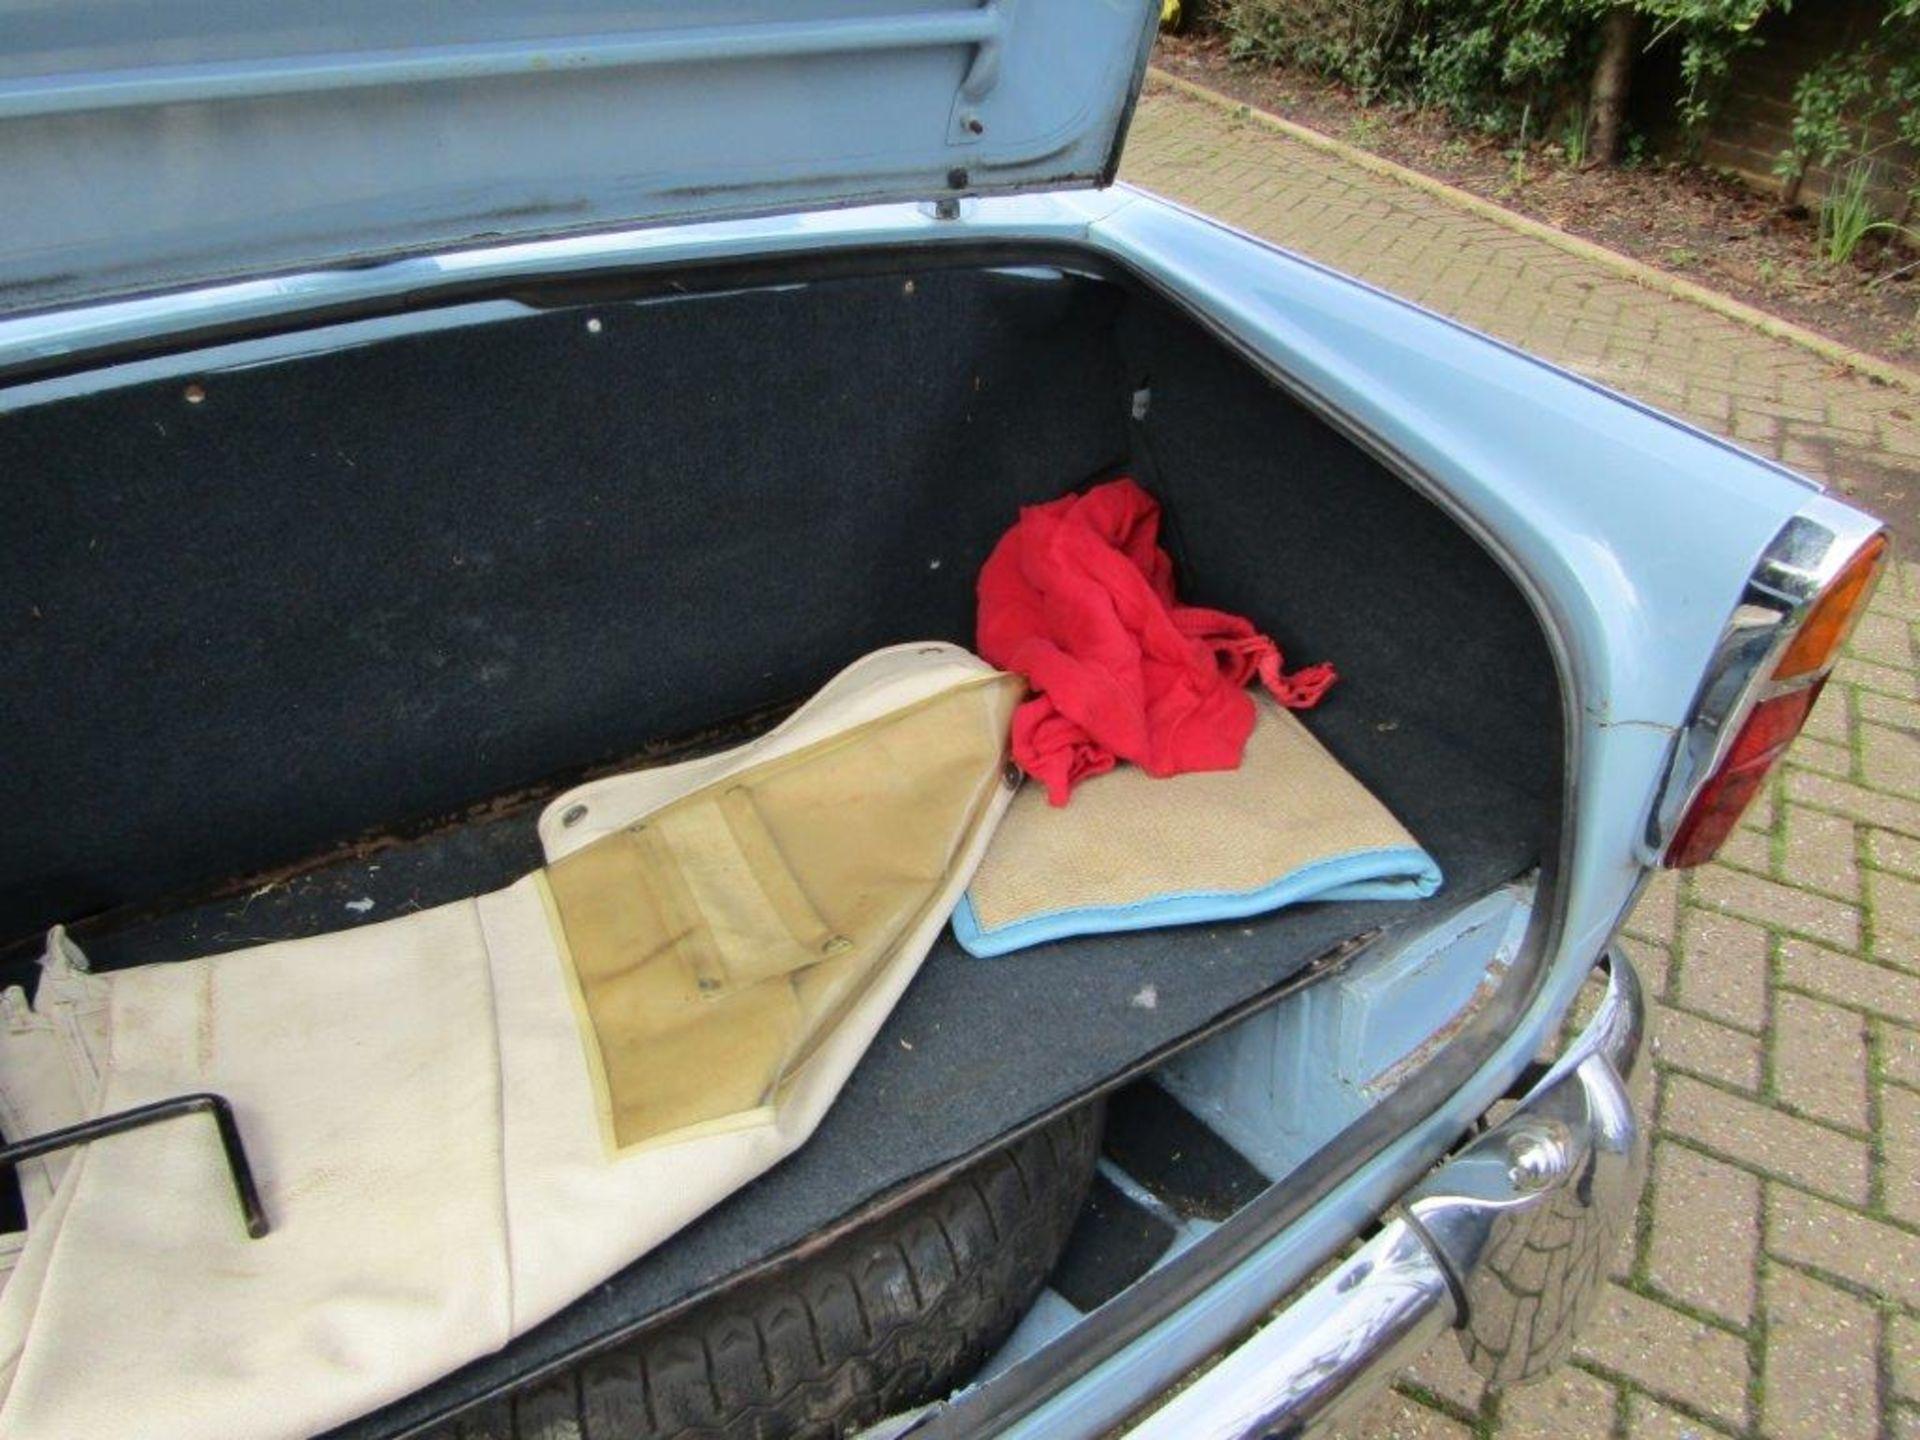 1965 Triumph TR4 - Image 14 of 17